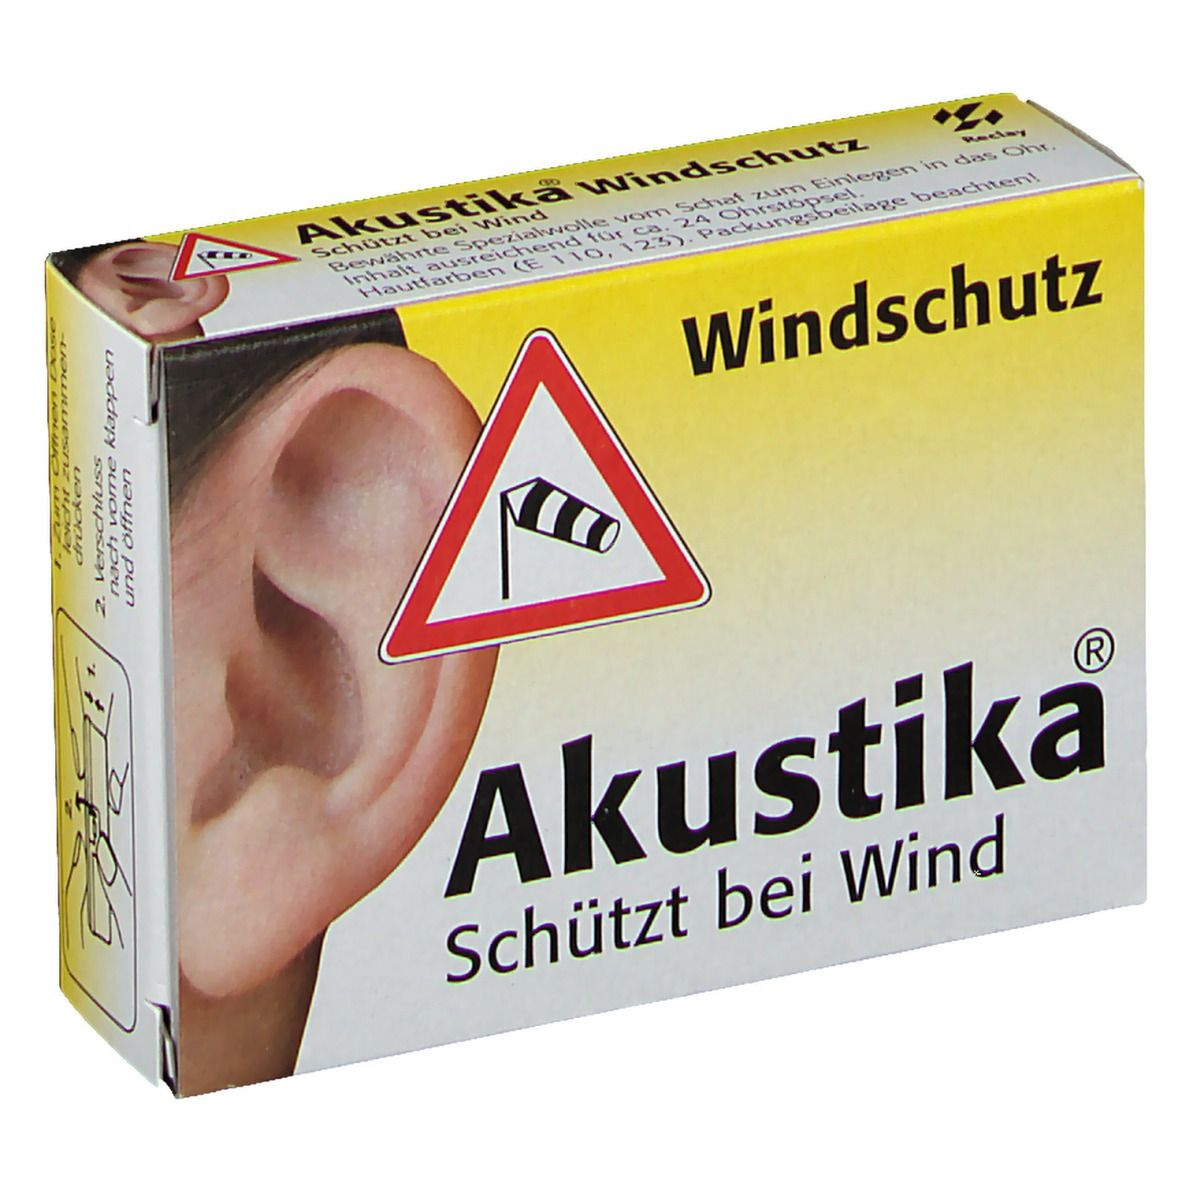 Akustika® Windschutz